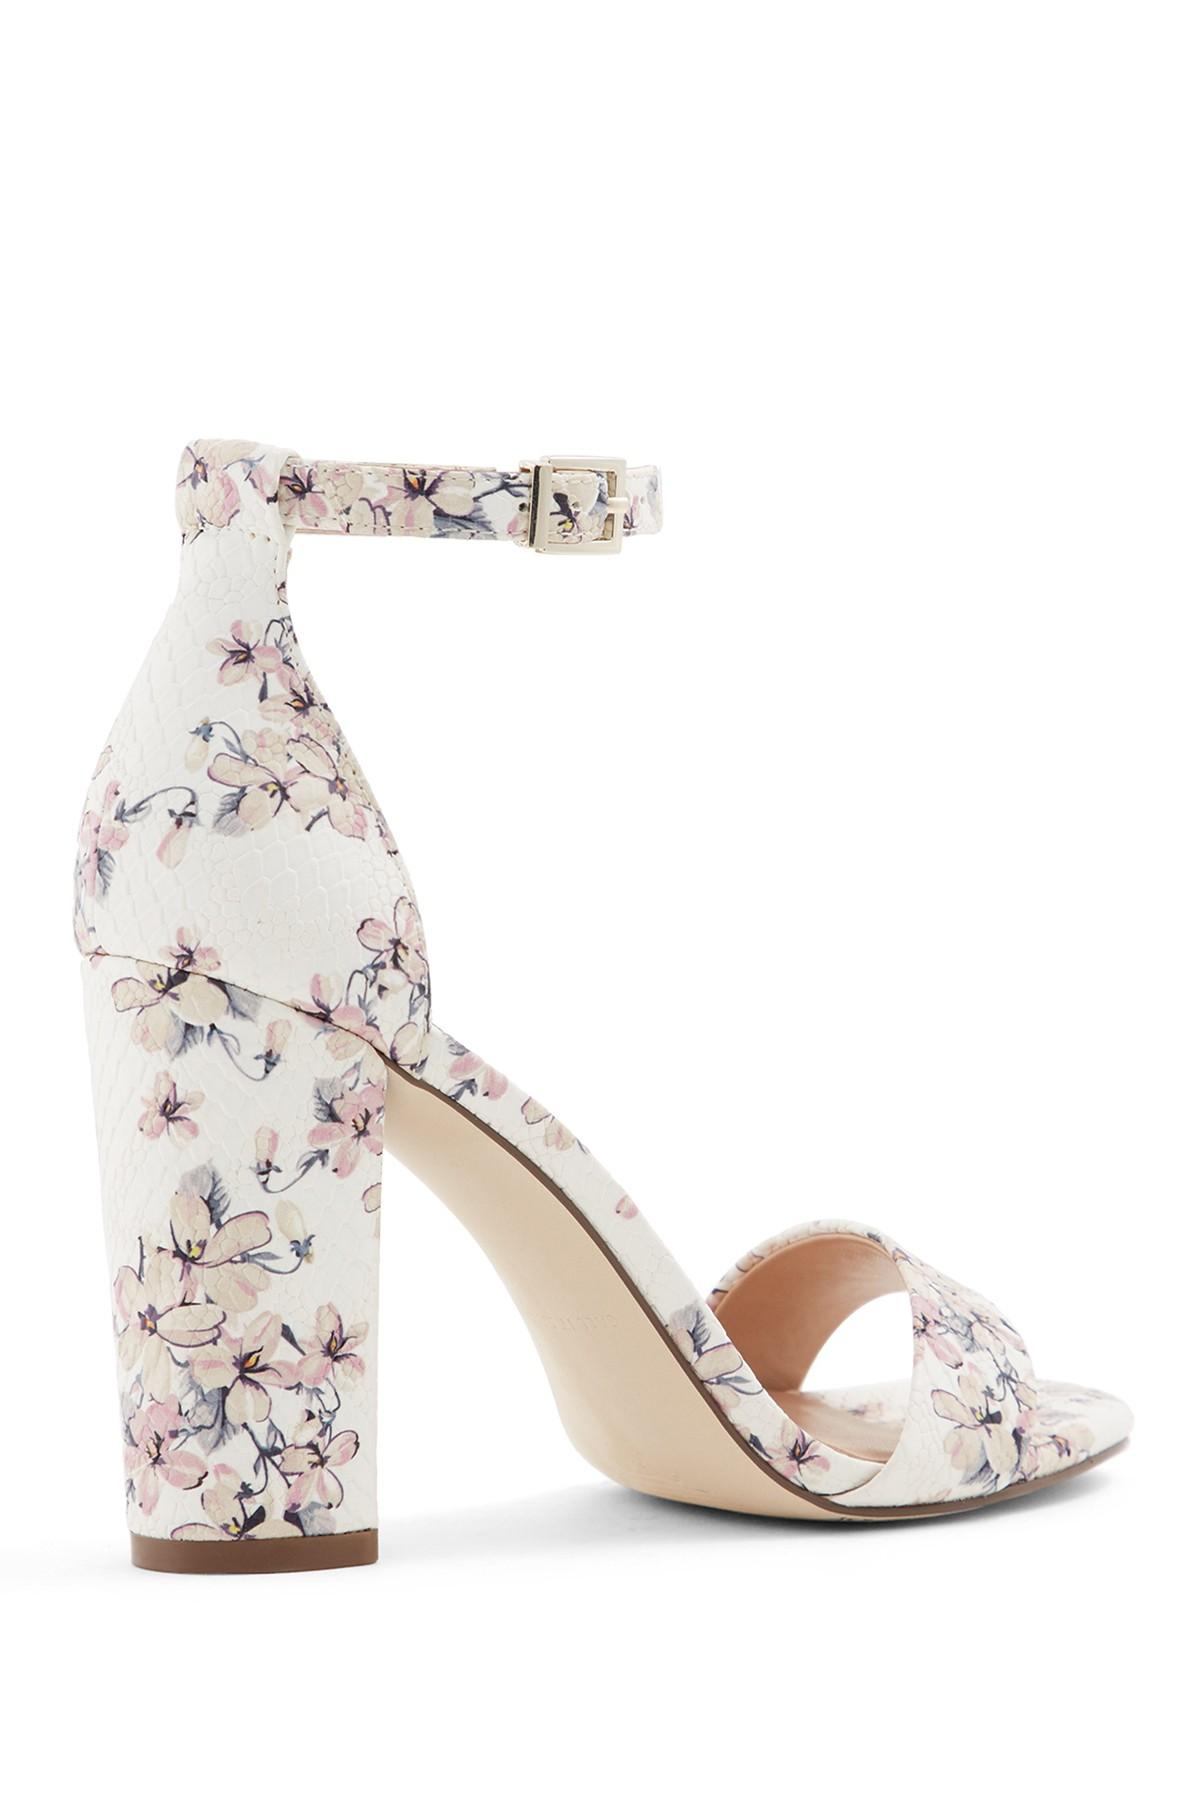 76fc20cfff Call It Spring Tayvia Block Heel Sandal in White - Lyst